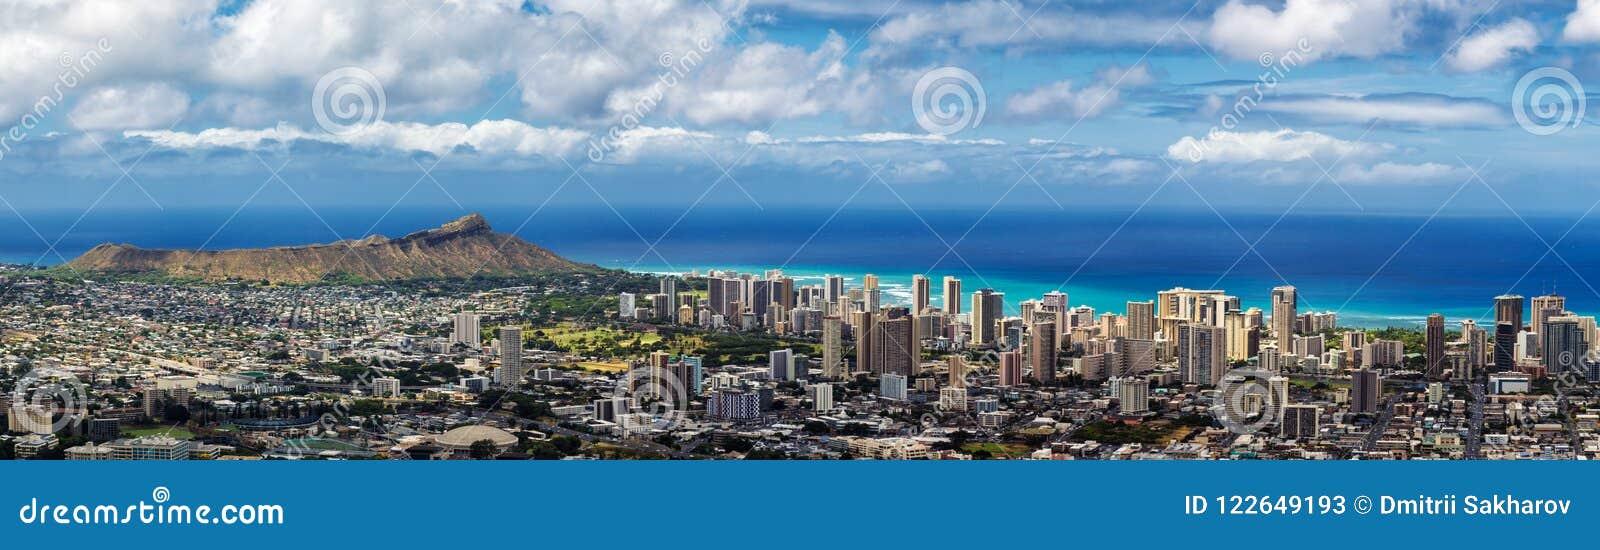 Panoramablick von Honolulu-Stadt, Waikiki und Diamond Head